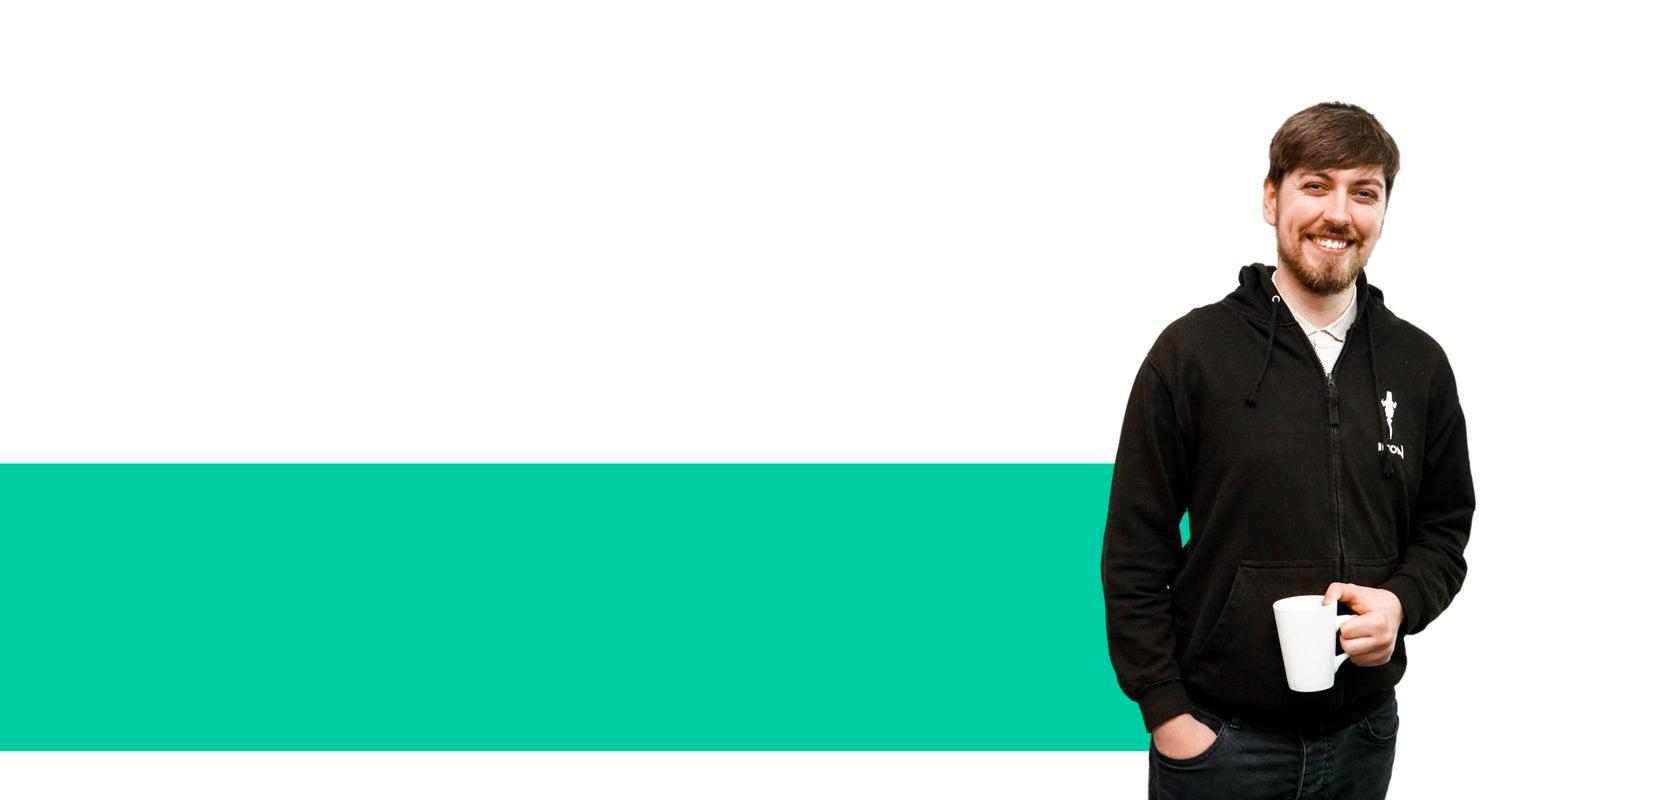 Starting in Development: An Interview  with Support Developer, Alex Bromilow